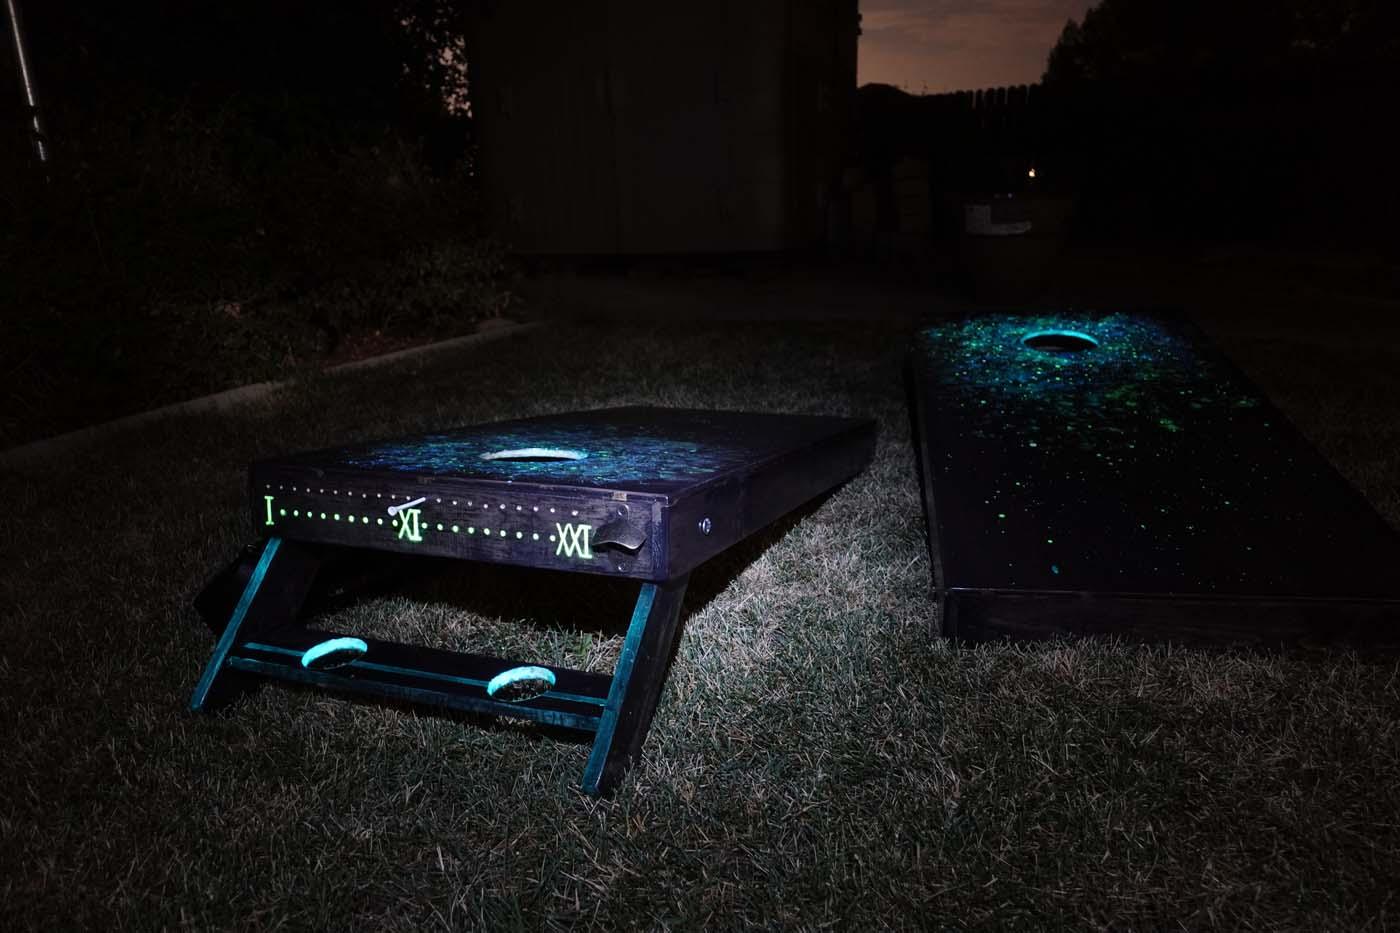 Lansia's galaxy glow-in-the-dark cornhole board with beverage holders